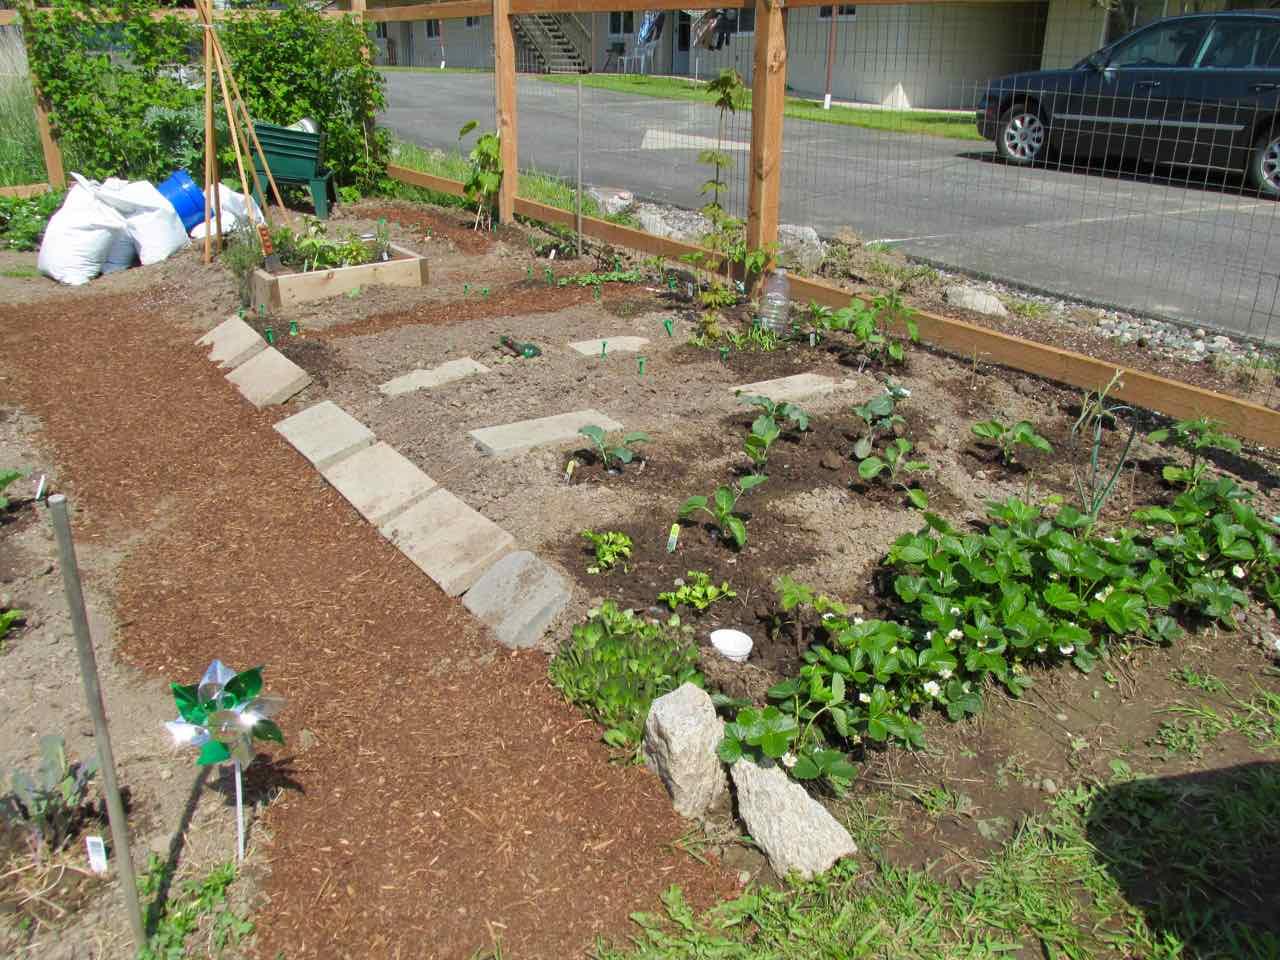 DJan-ity: World Naked Gardening Day